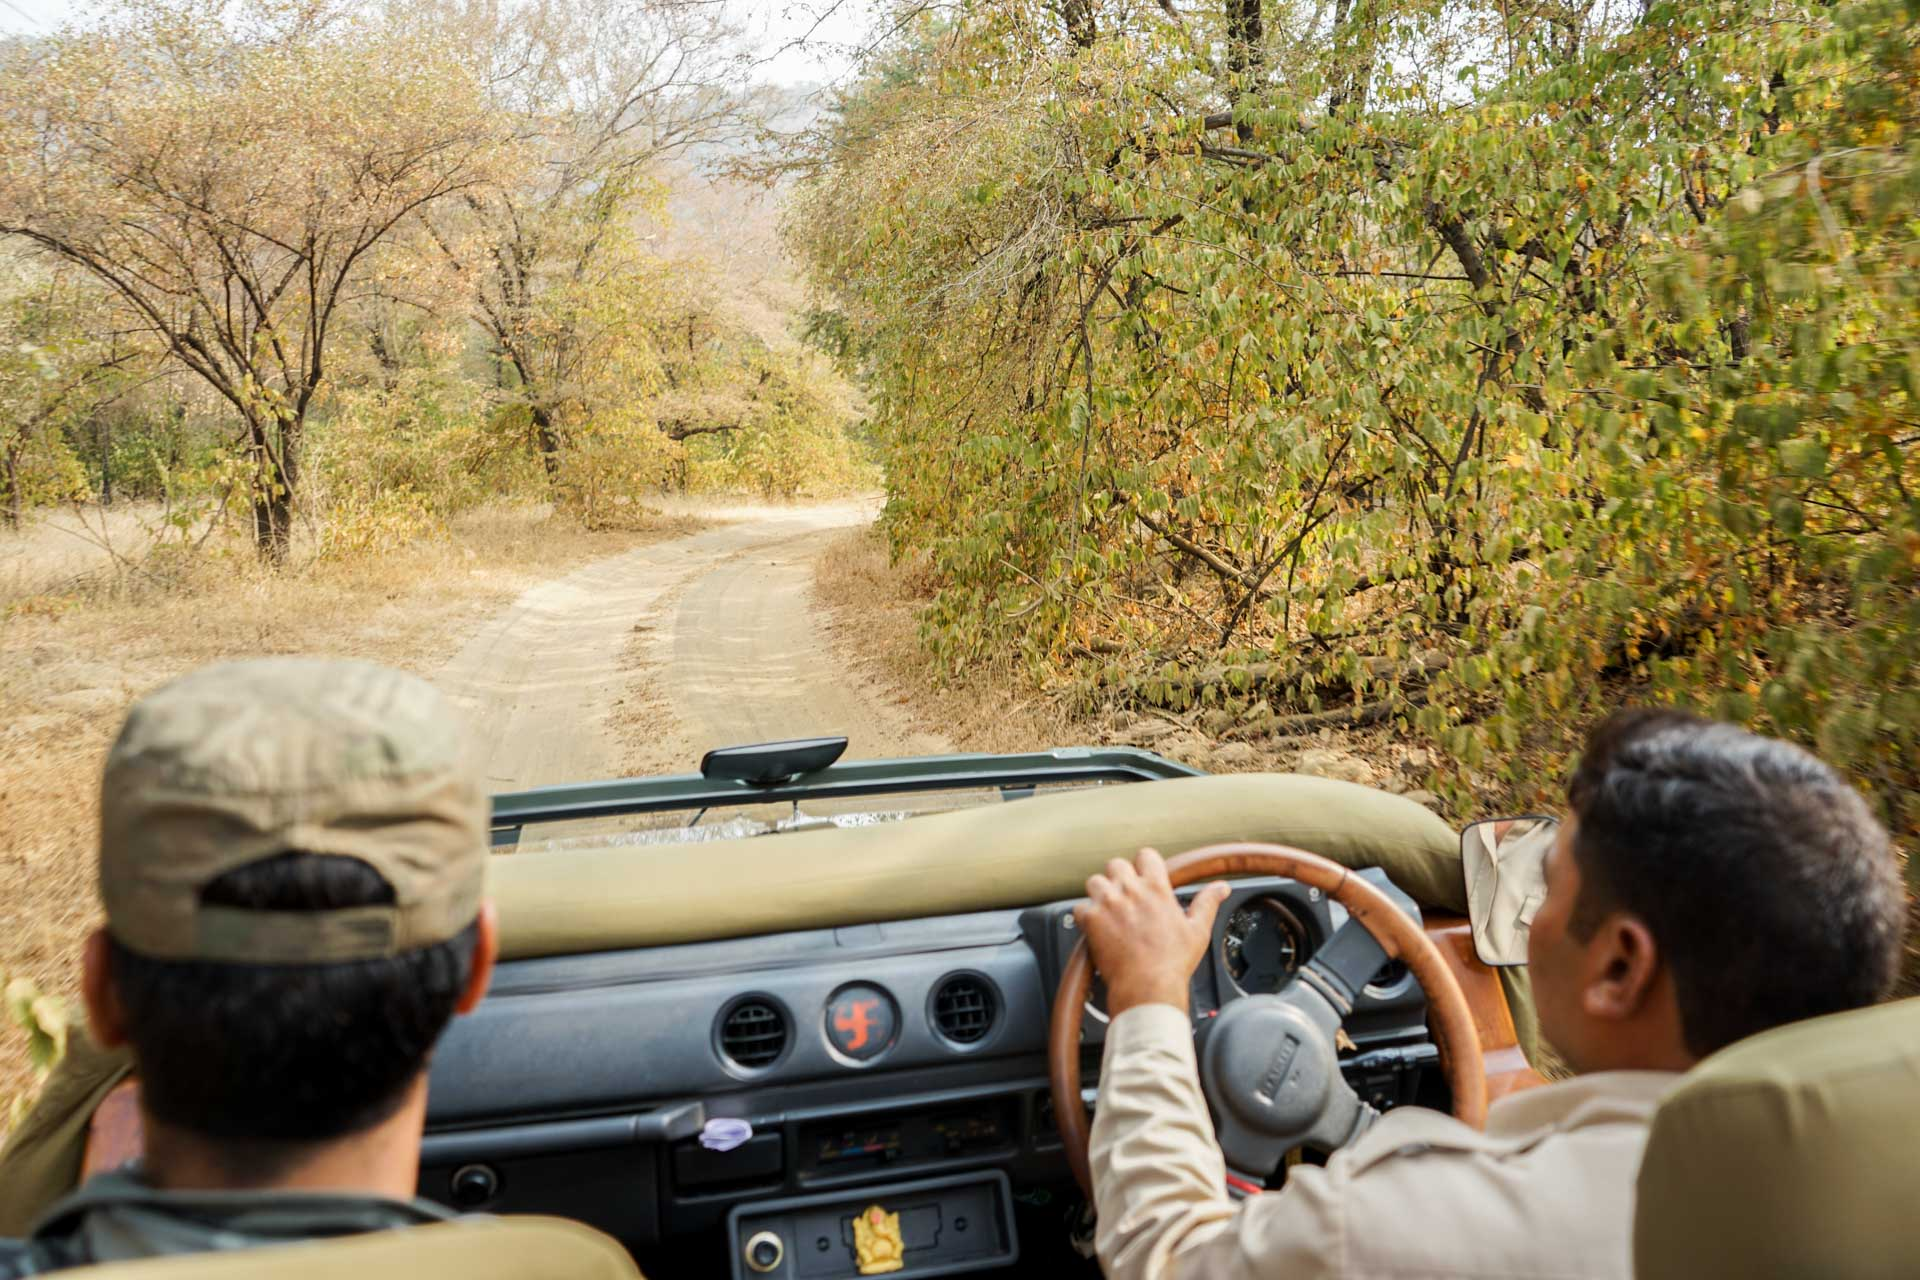 Aman-i-Khas, Parc national de Ranthambore